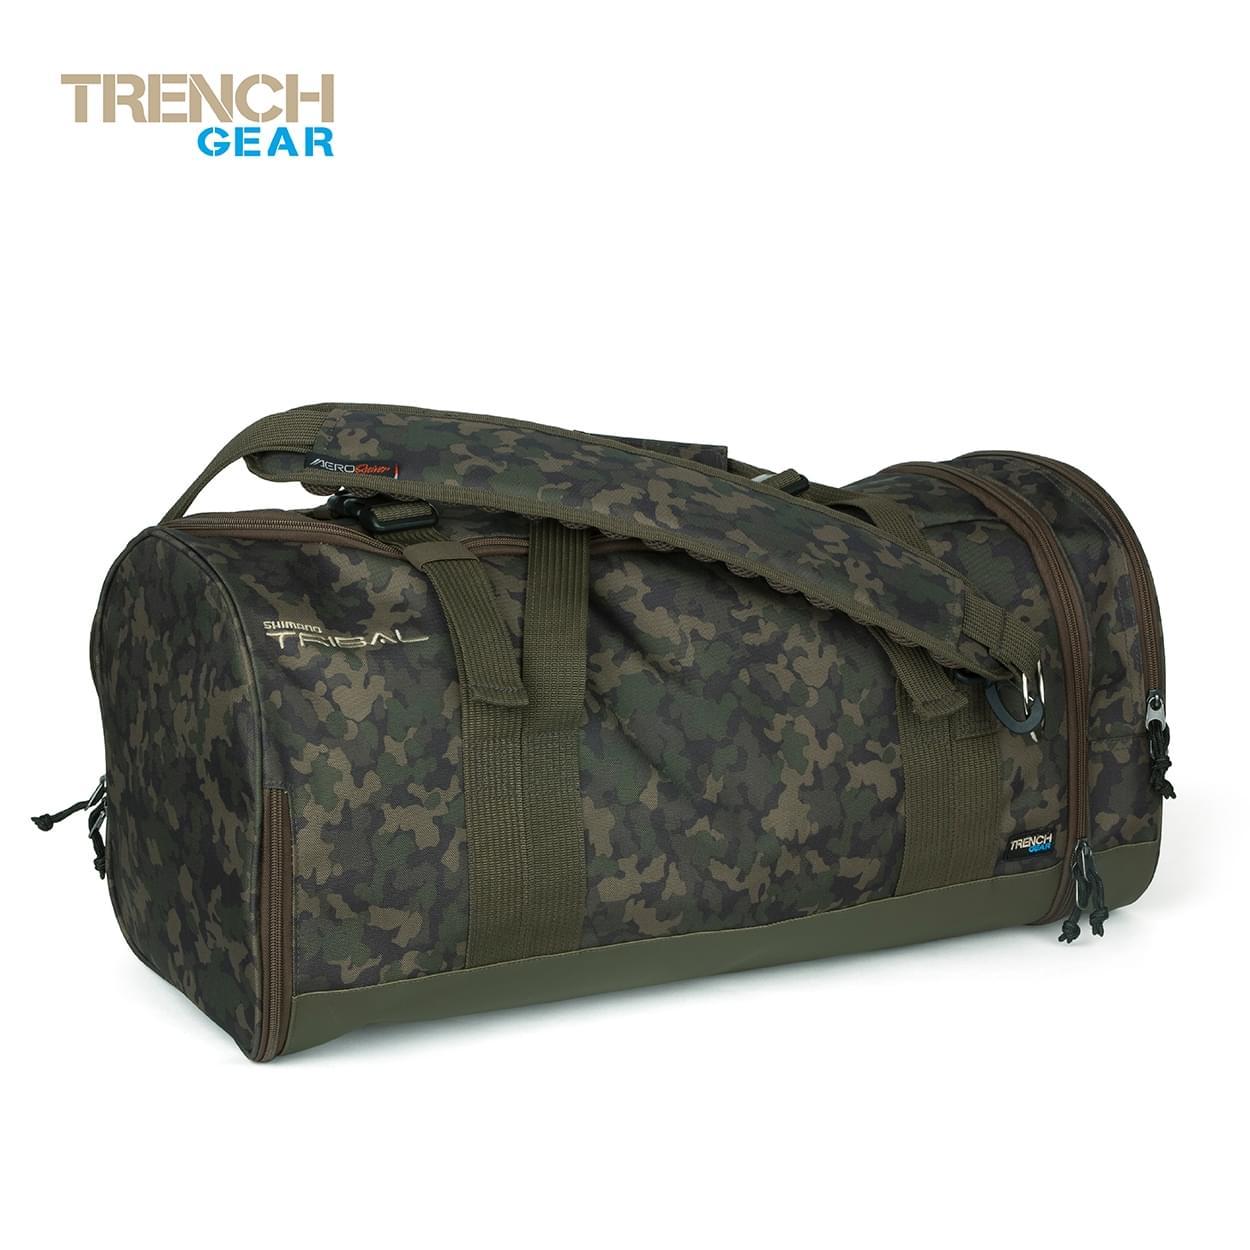 Shimano Trench Gear Clothing Bag